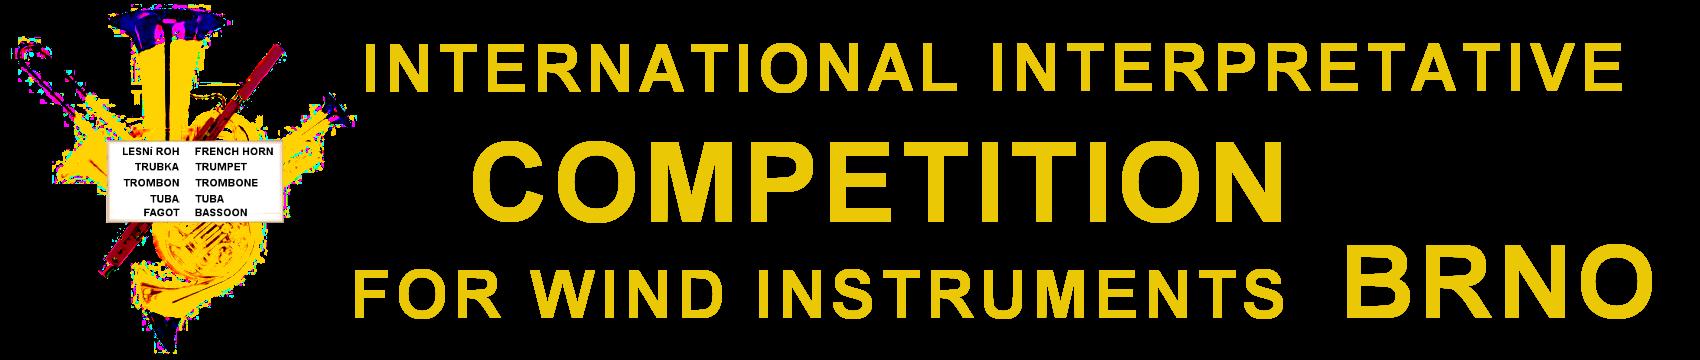 International interpretative wind instruments competition Brno